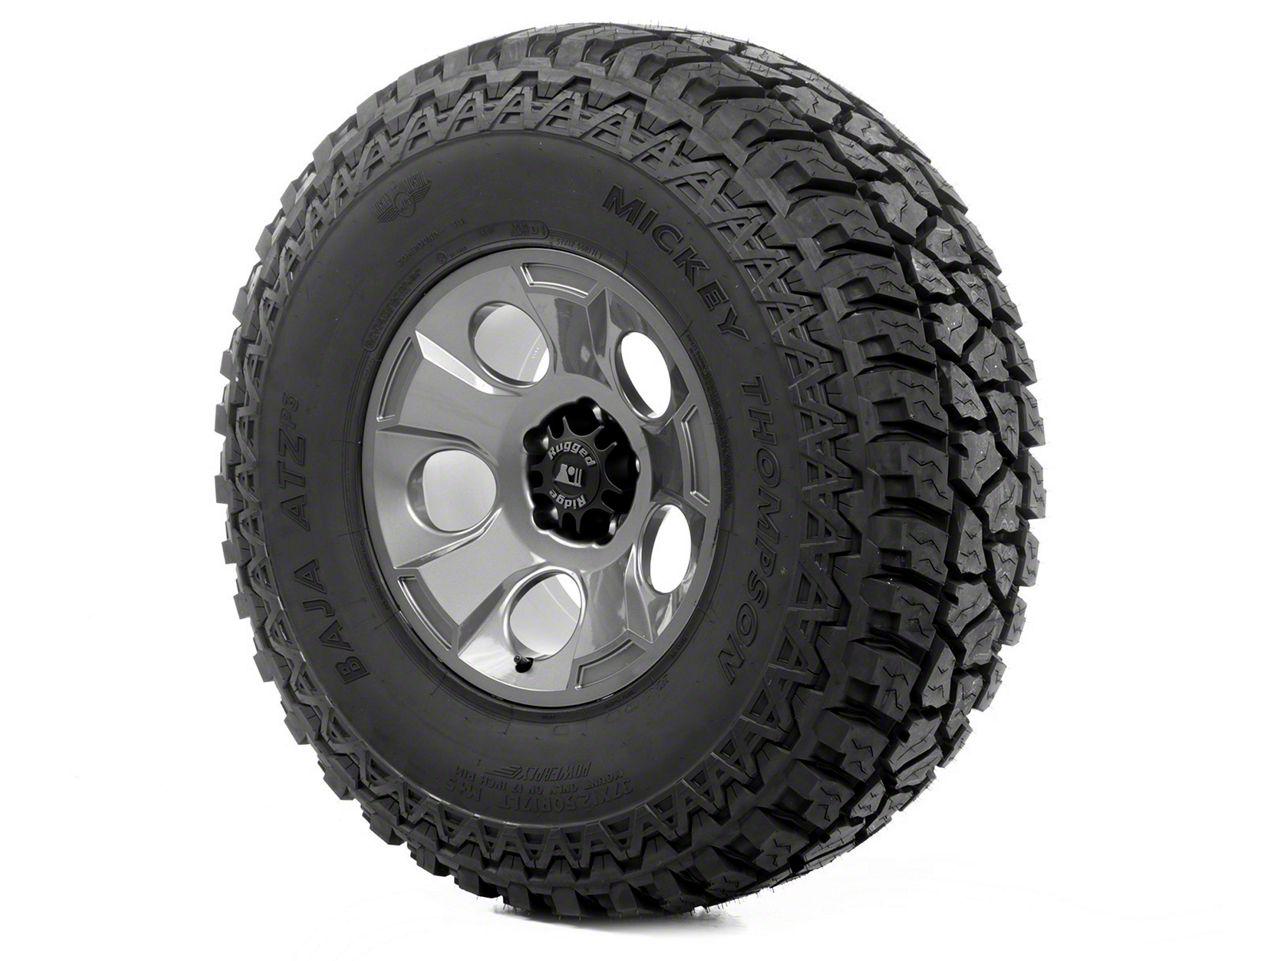 Rugged Ridge Drakon Wheel 17x9 Gun Metal and Mickey Thompson ATZ P3 37x12.50x17 Tire (13-18 Jeep Wrangler JK; 2018 Jeep Wrangler JL)